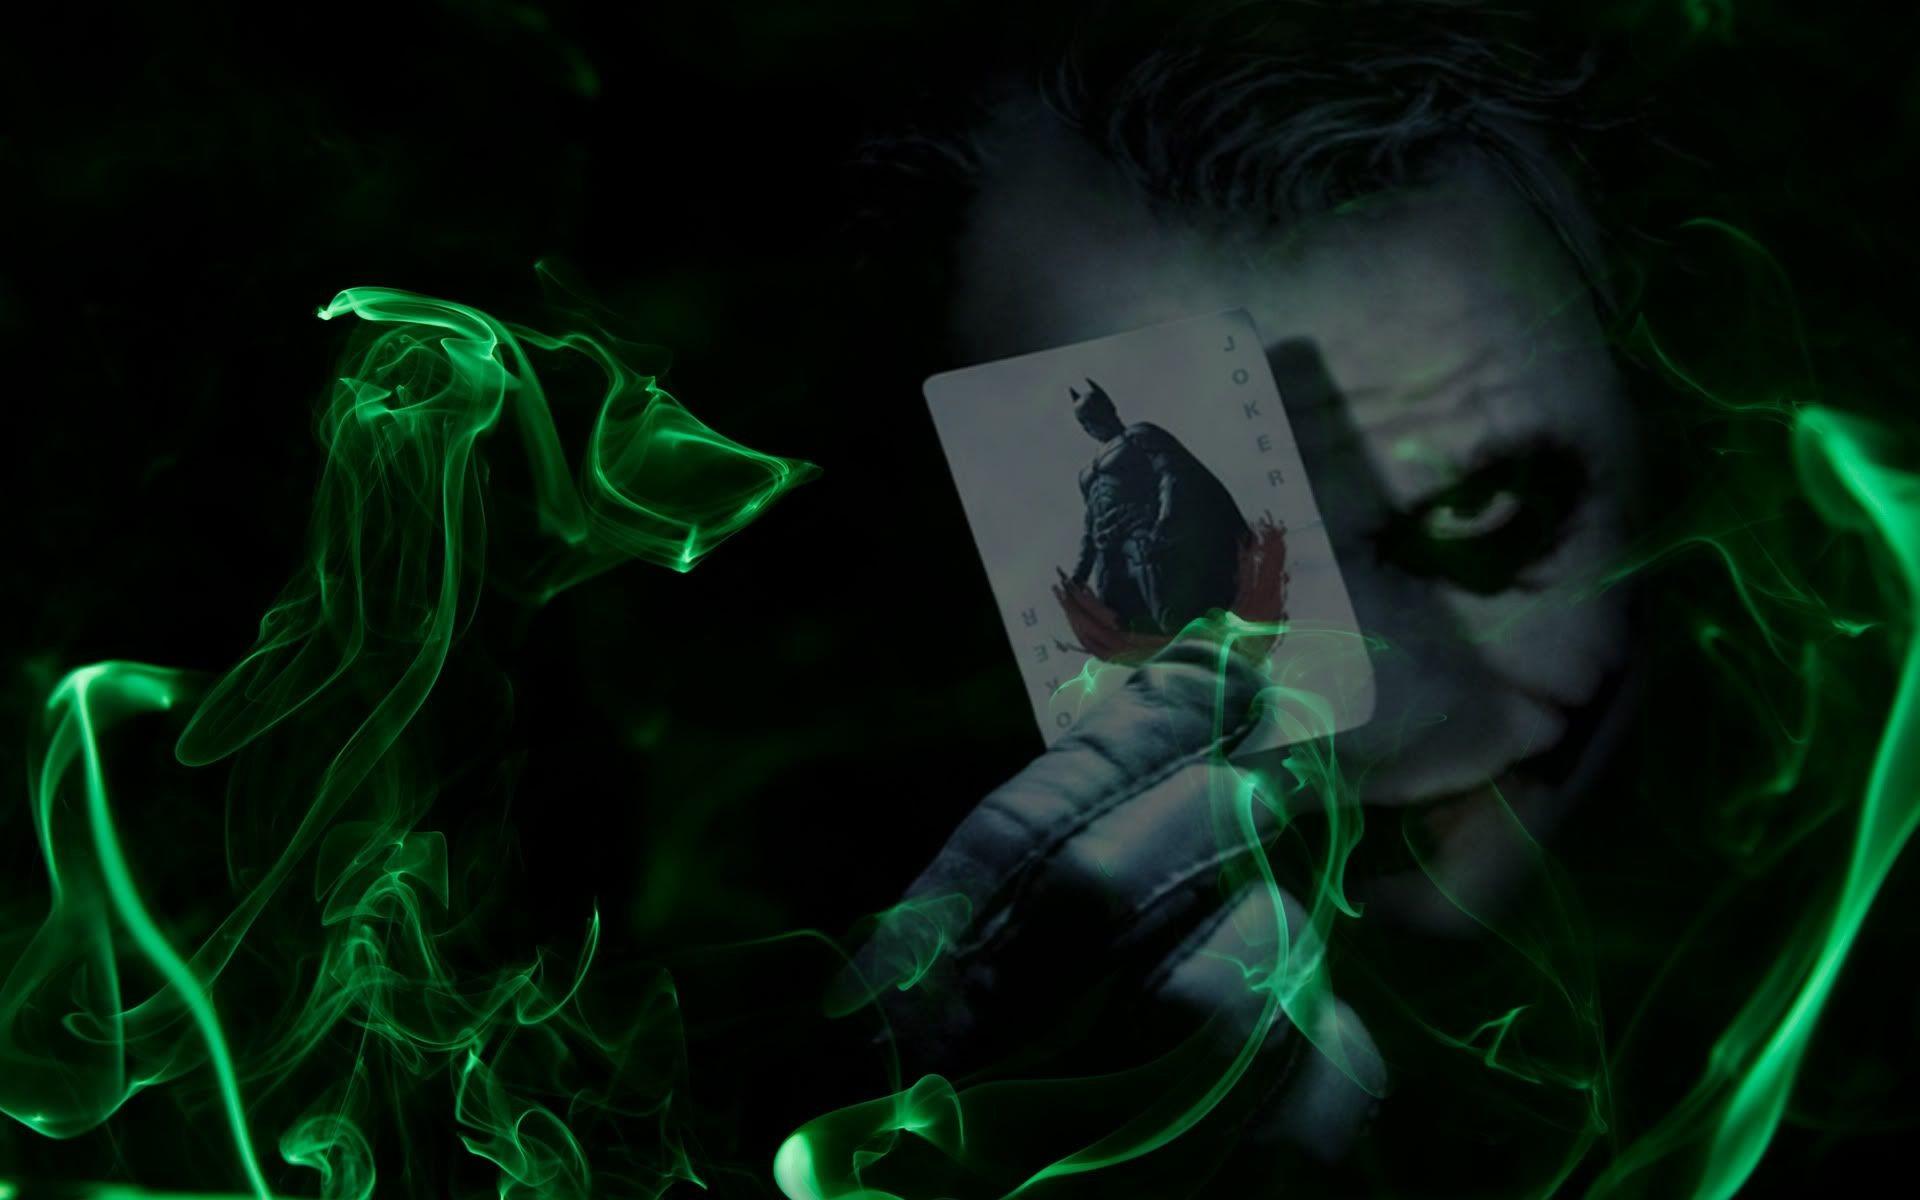 1920x1080 batman dark knight joker hd wallpaper 1920x1080 need iphone 6s plus wallpaper background for iphone6splus